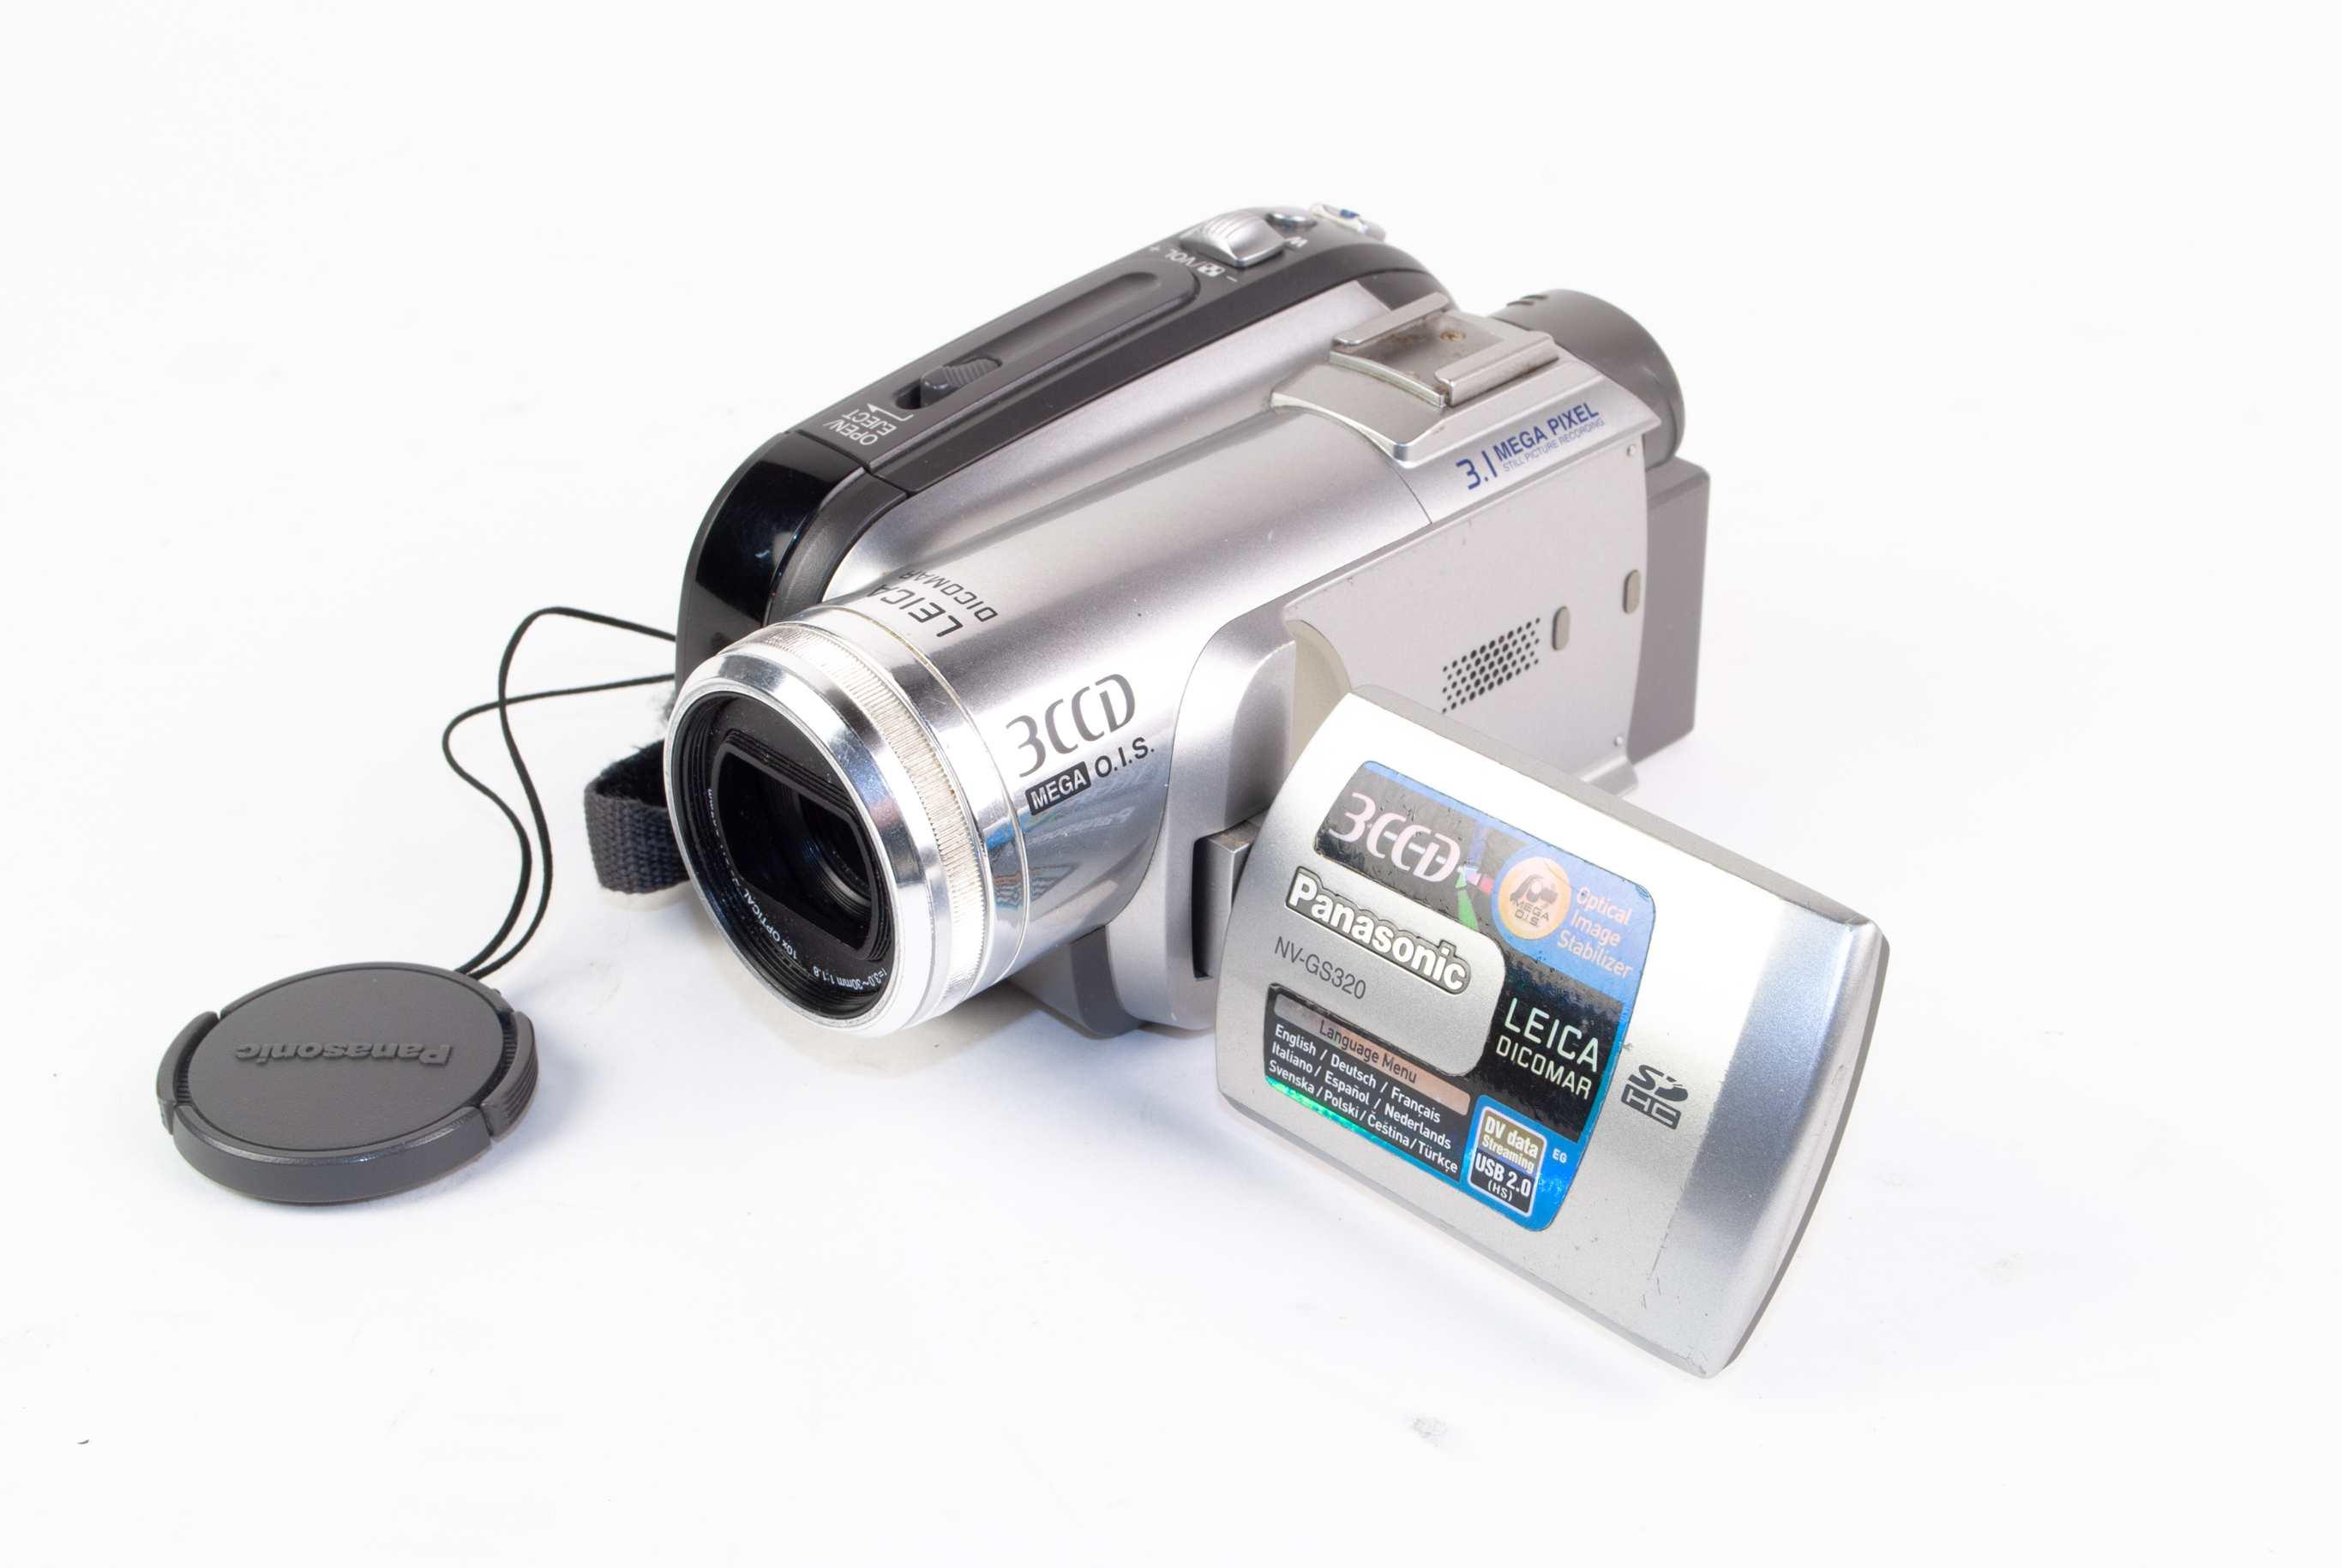 NV-GS320